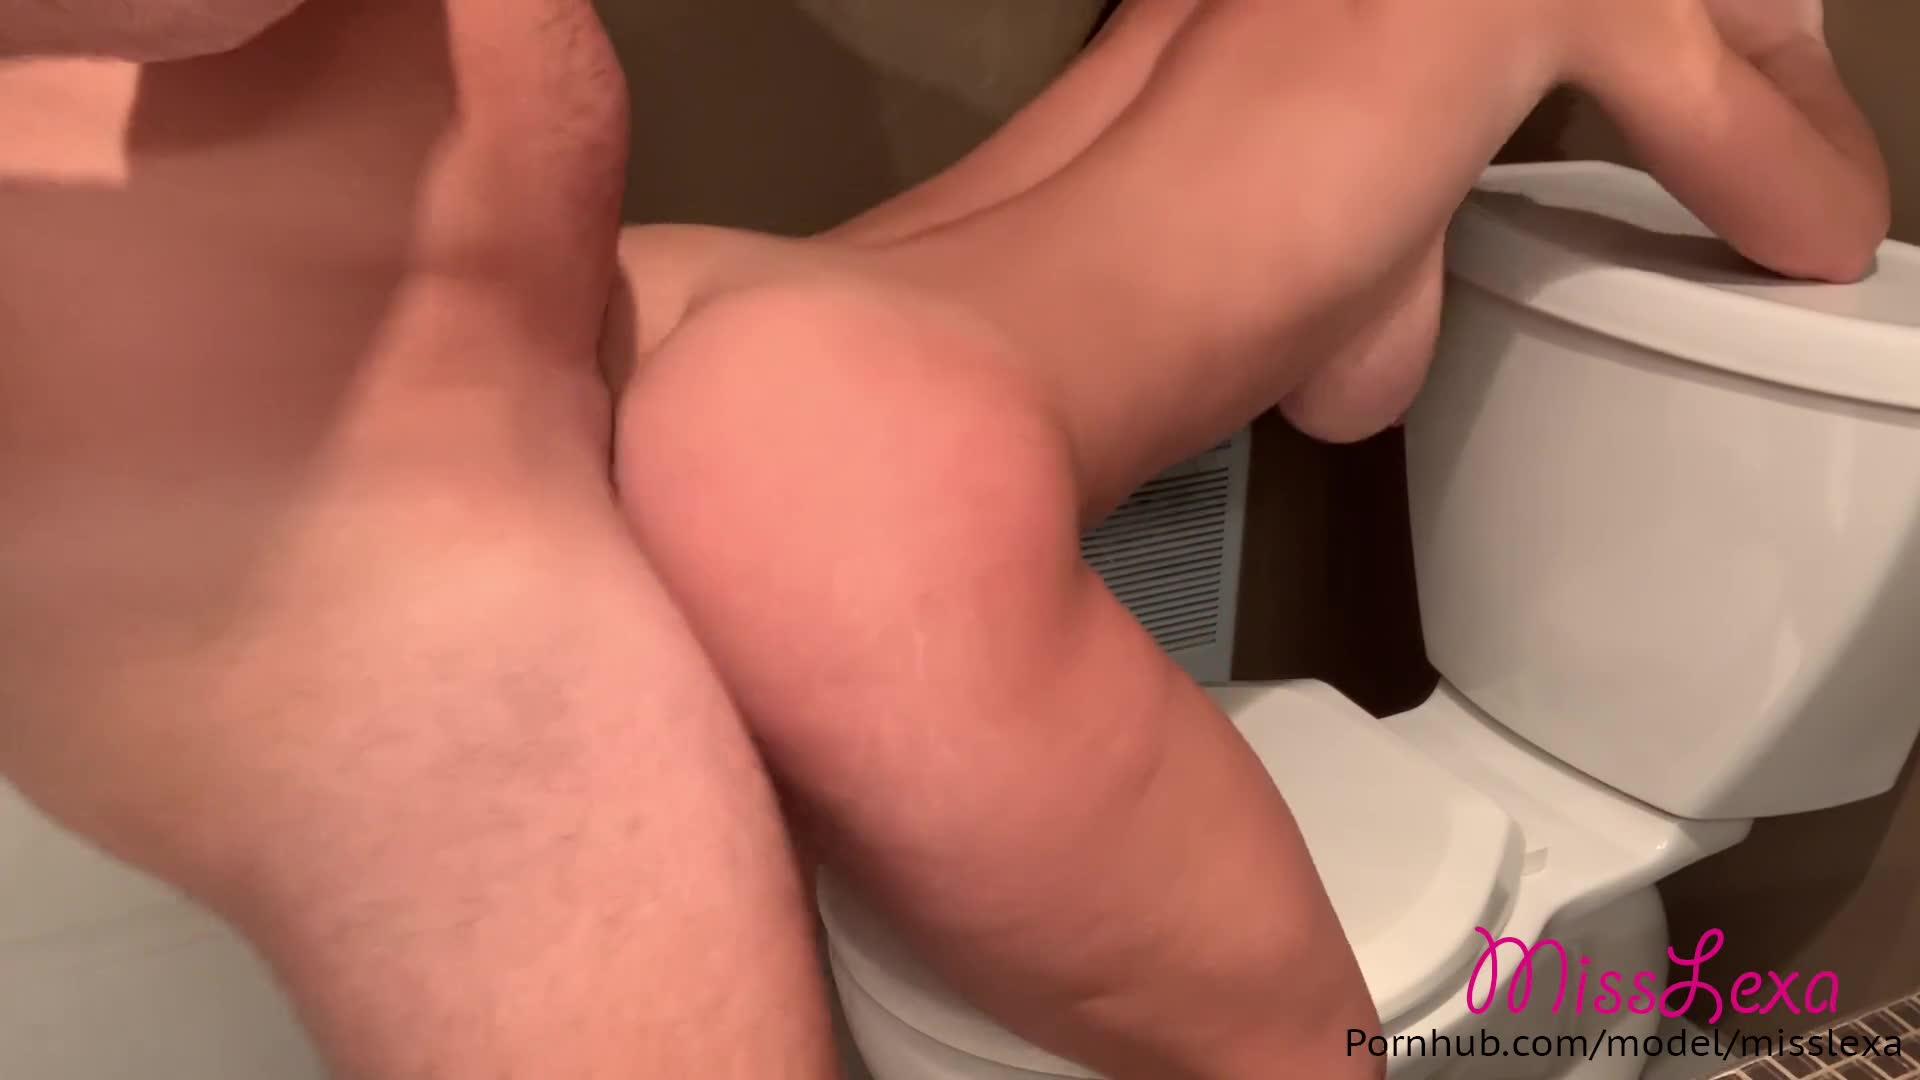 Big Ass White Teen Solo